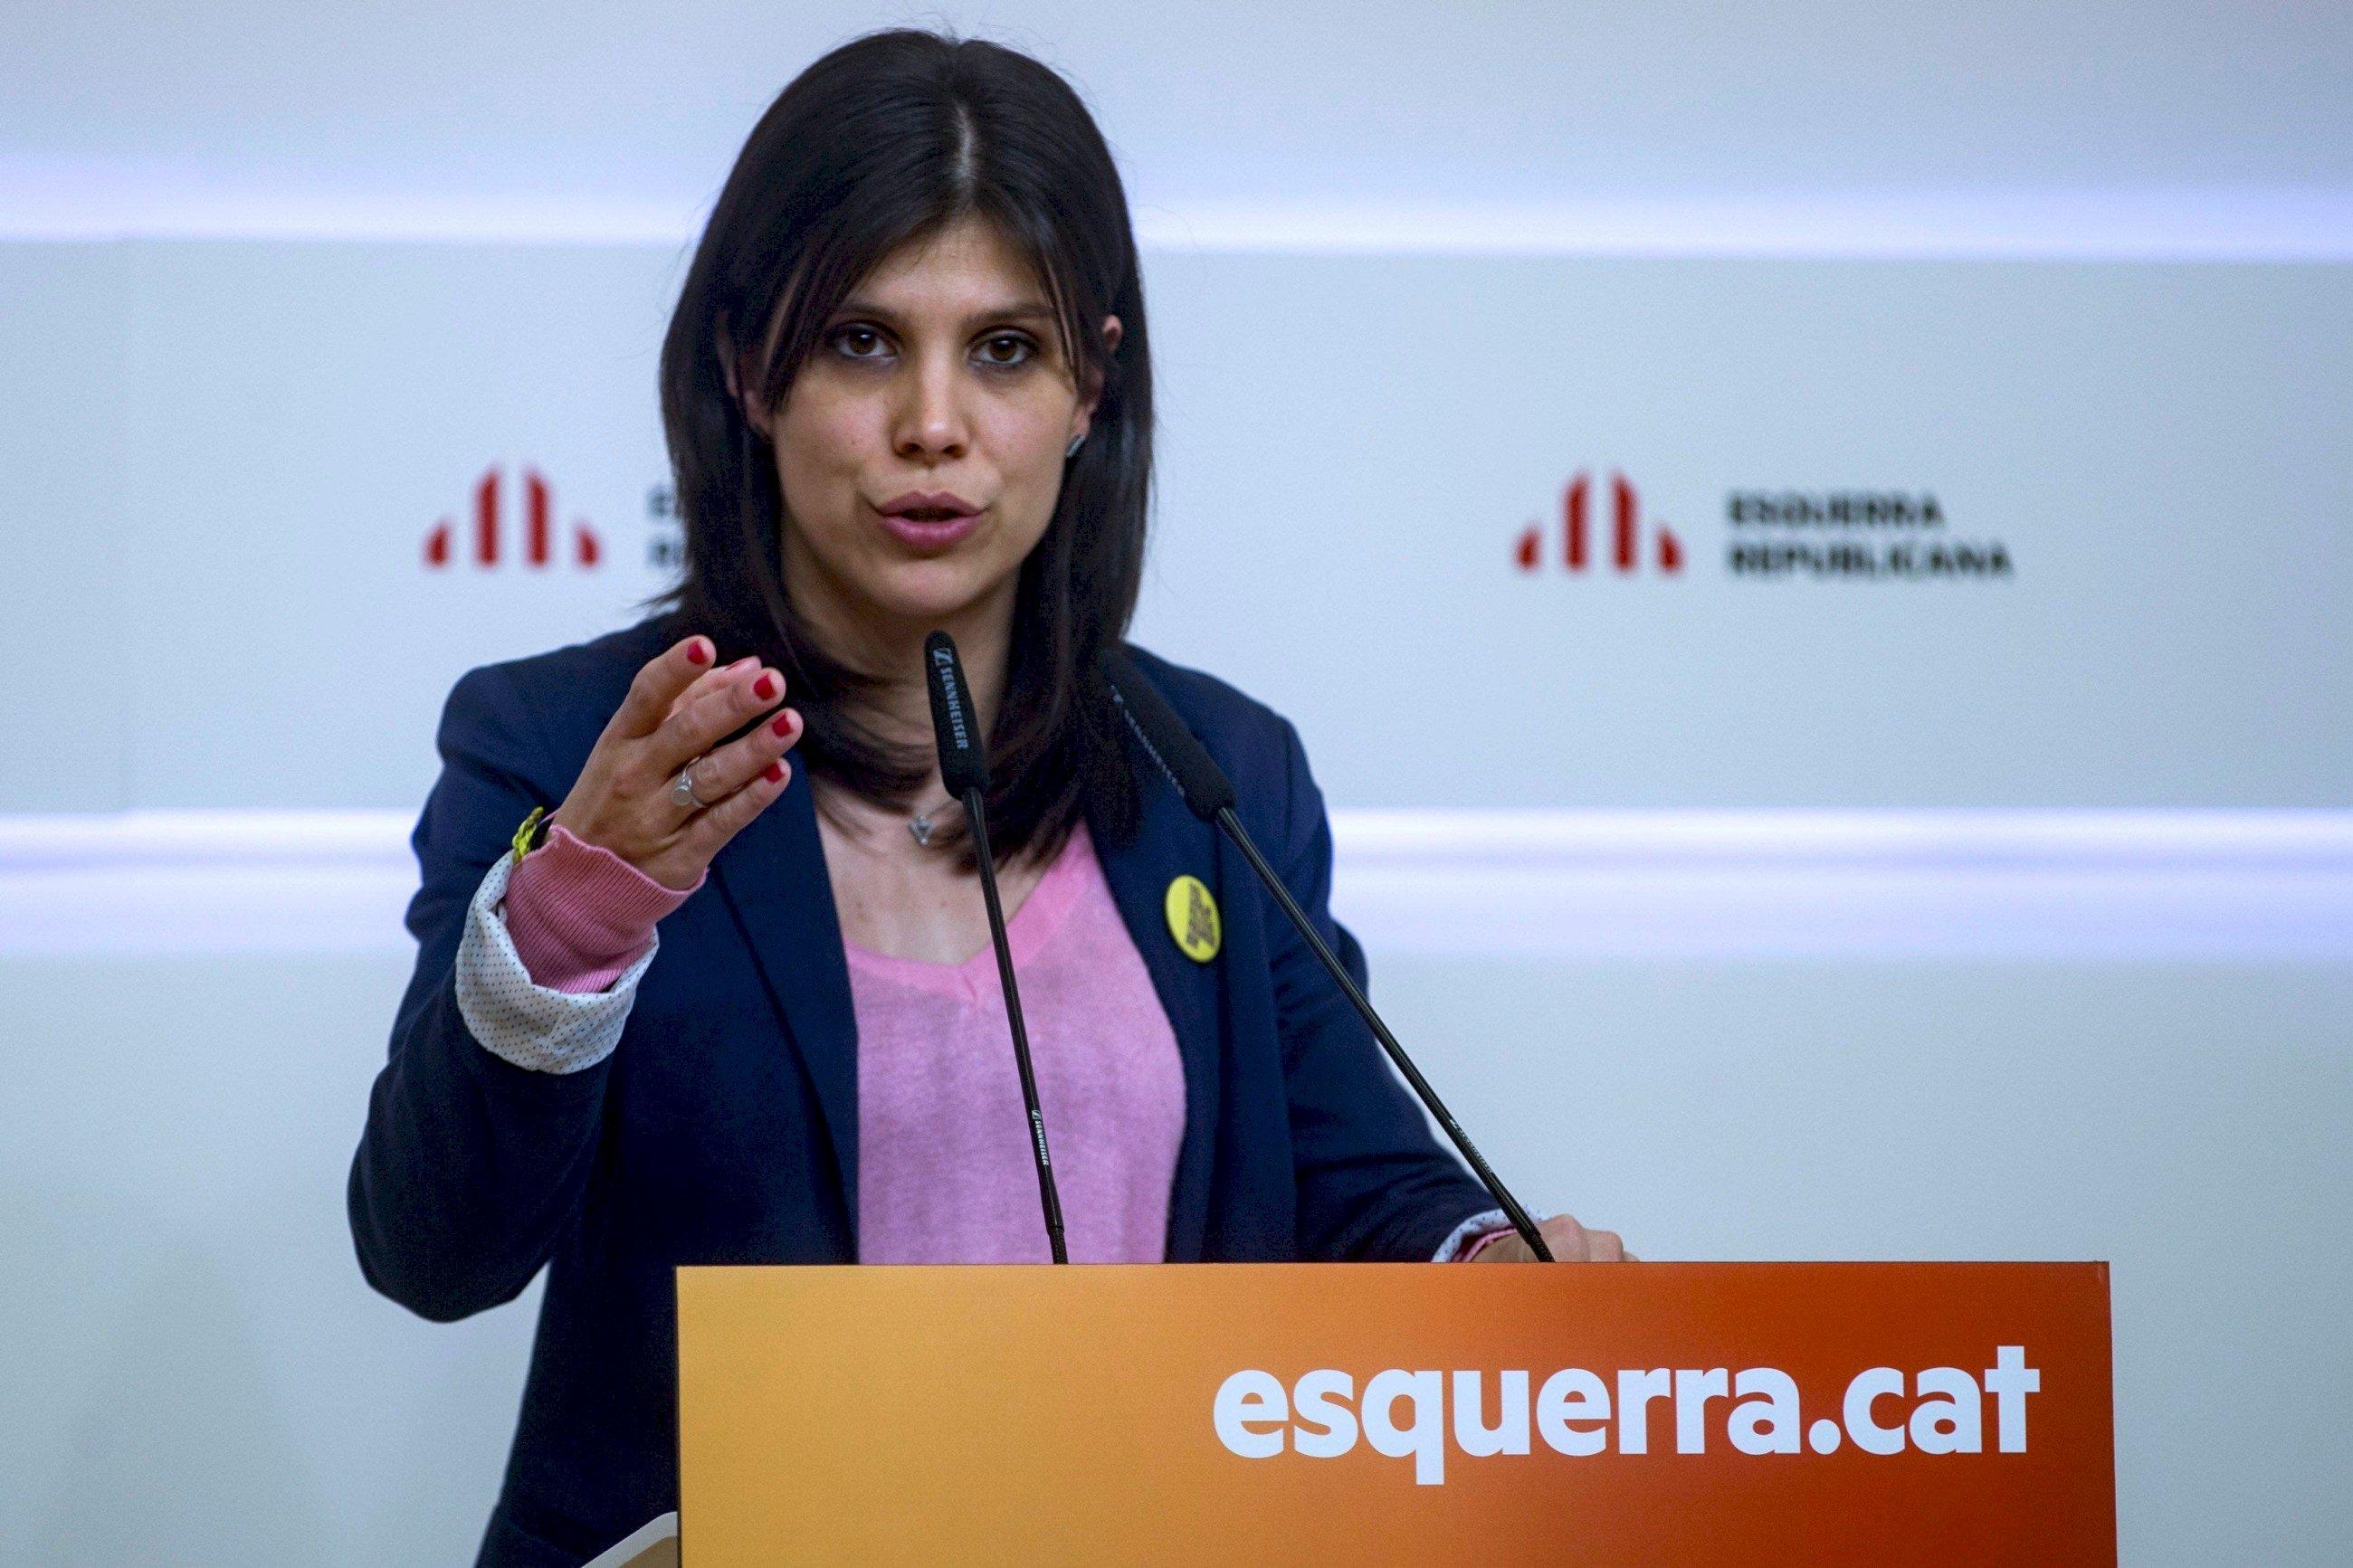 La portavoz de ERC, Marta Vilalta | EFE/QG/Archivo